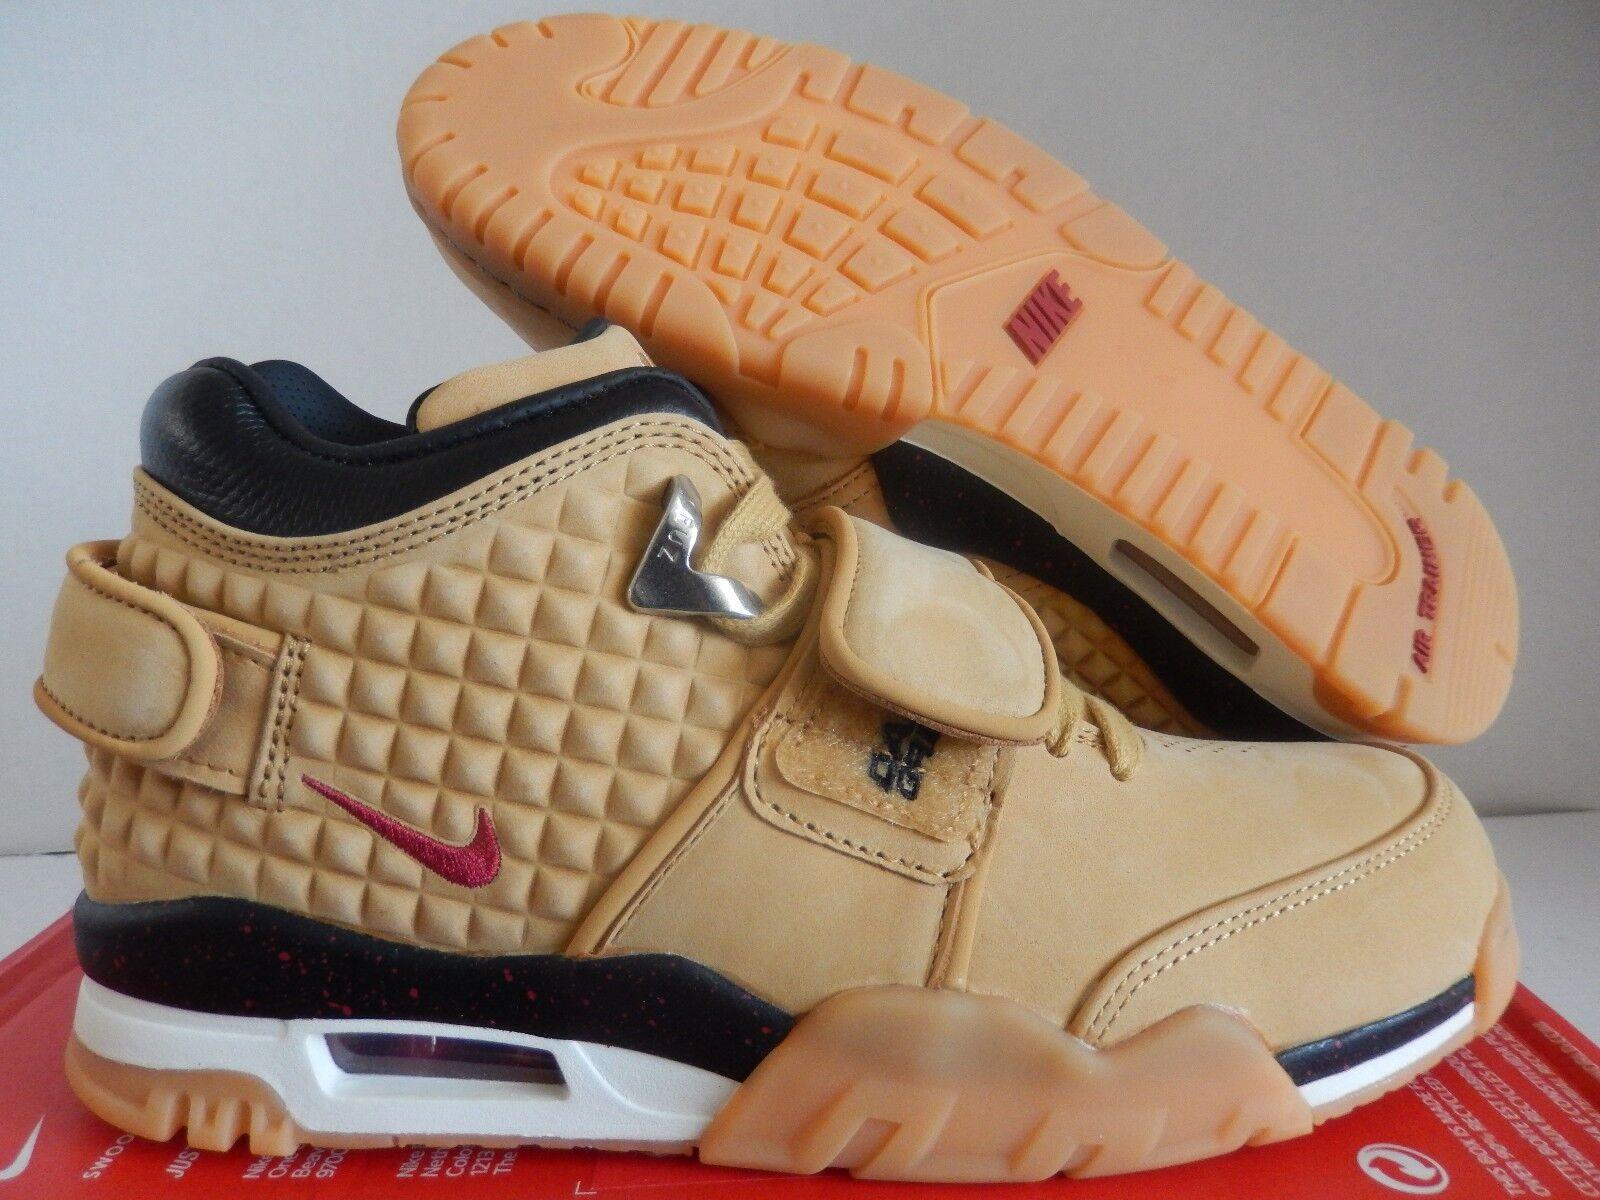 best website f62d2 1e65c ... Nike Essential Air Max 90 Ultra Essential Nike 819474 006 Mens Sz 15  DARK WOLF GREY GYM RED